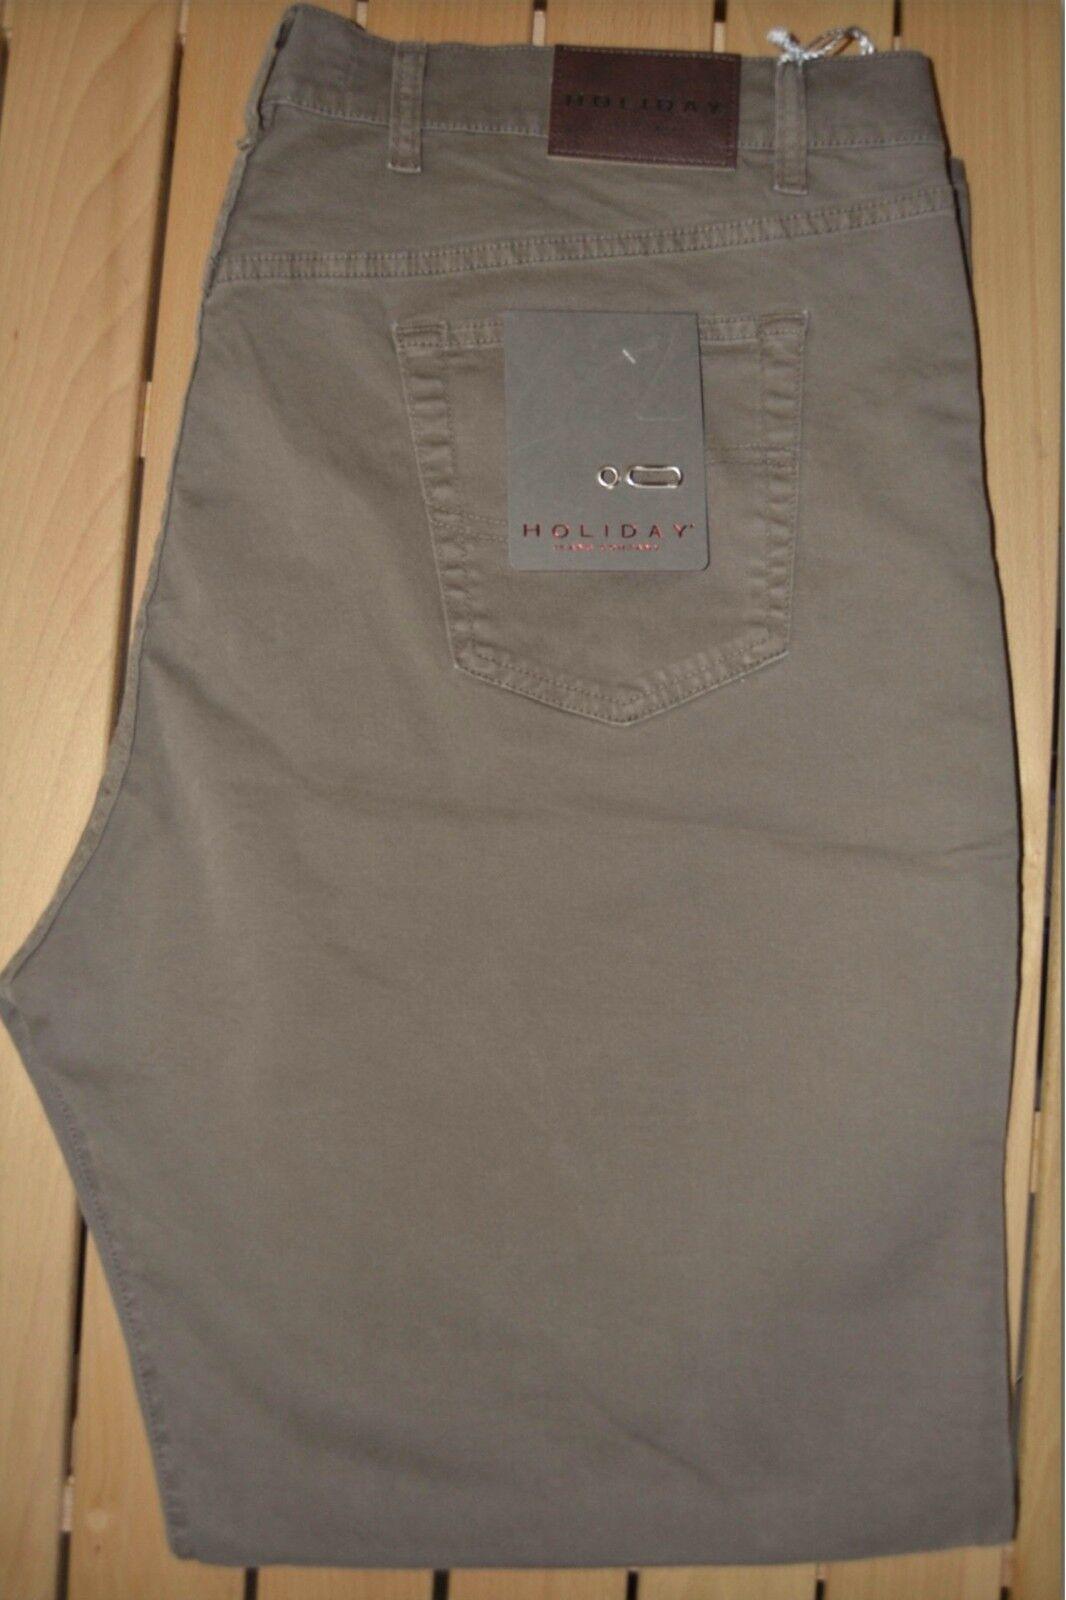 Pantalone uomo jeans taglie forti 62 64 66 68 HOLIDAY cotone strech tabacco